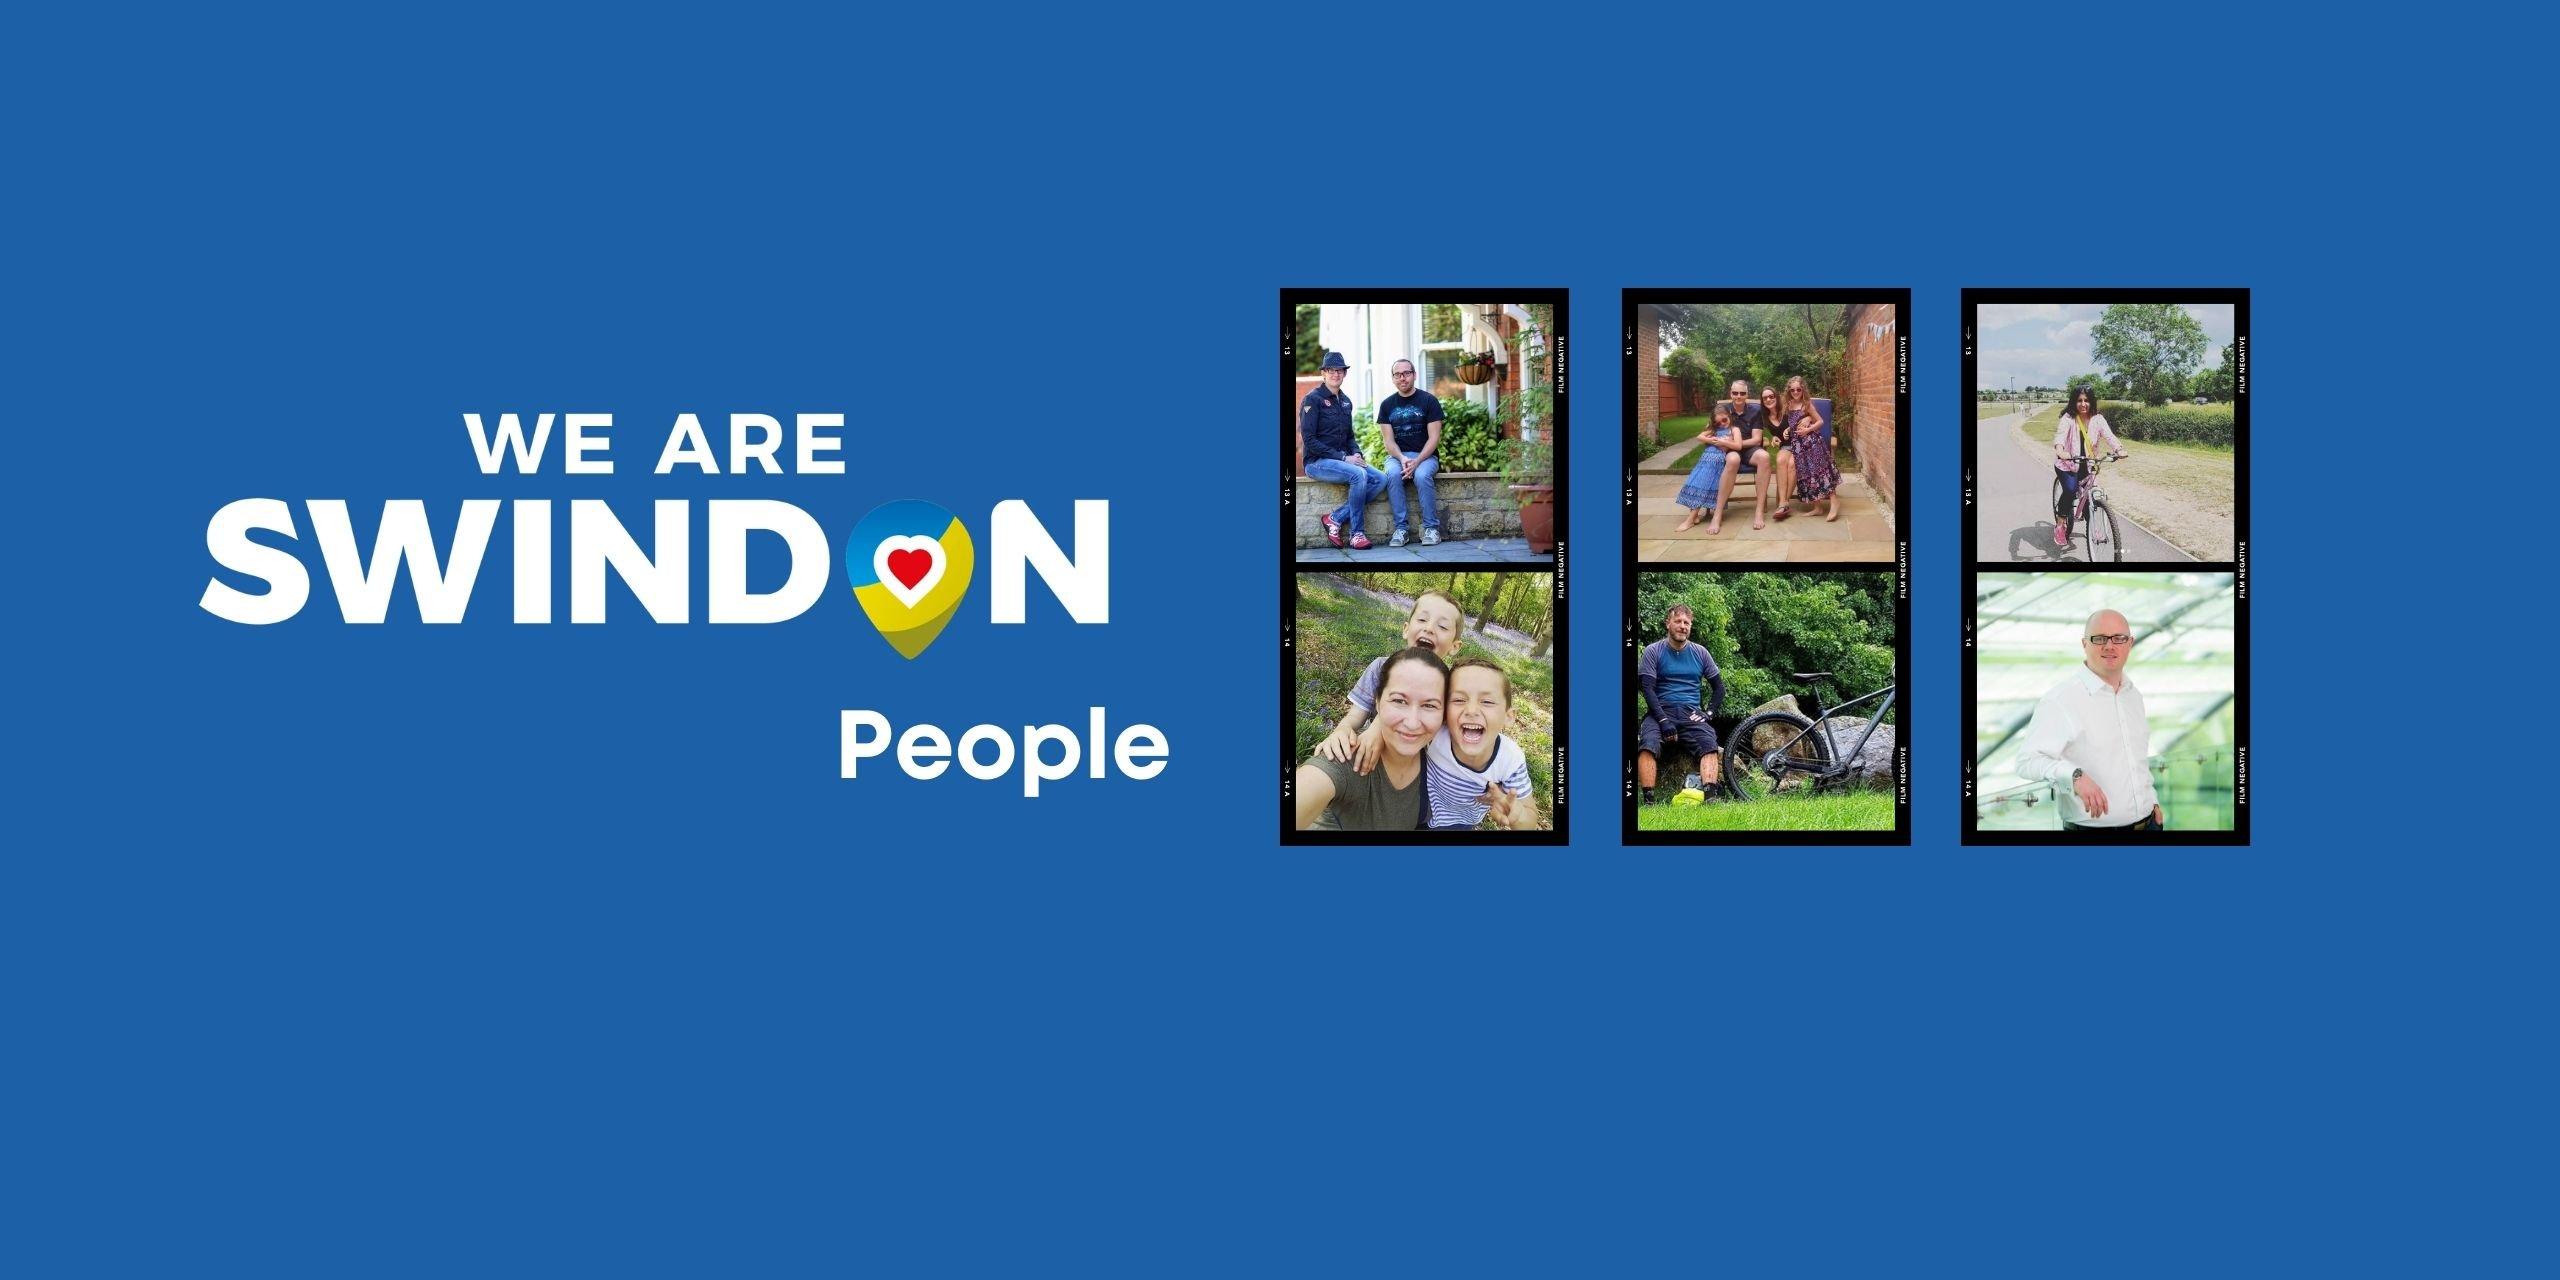 We Are Swindon People